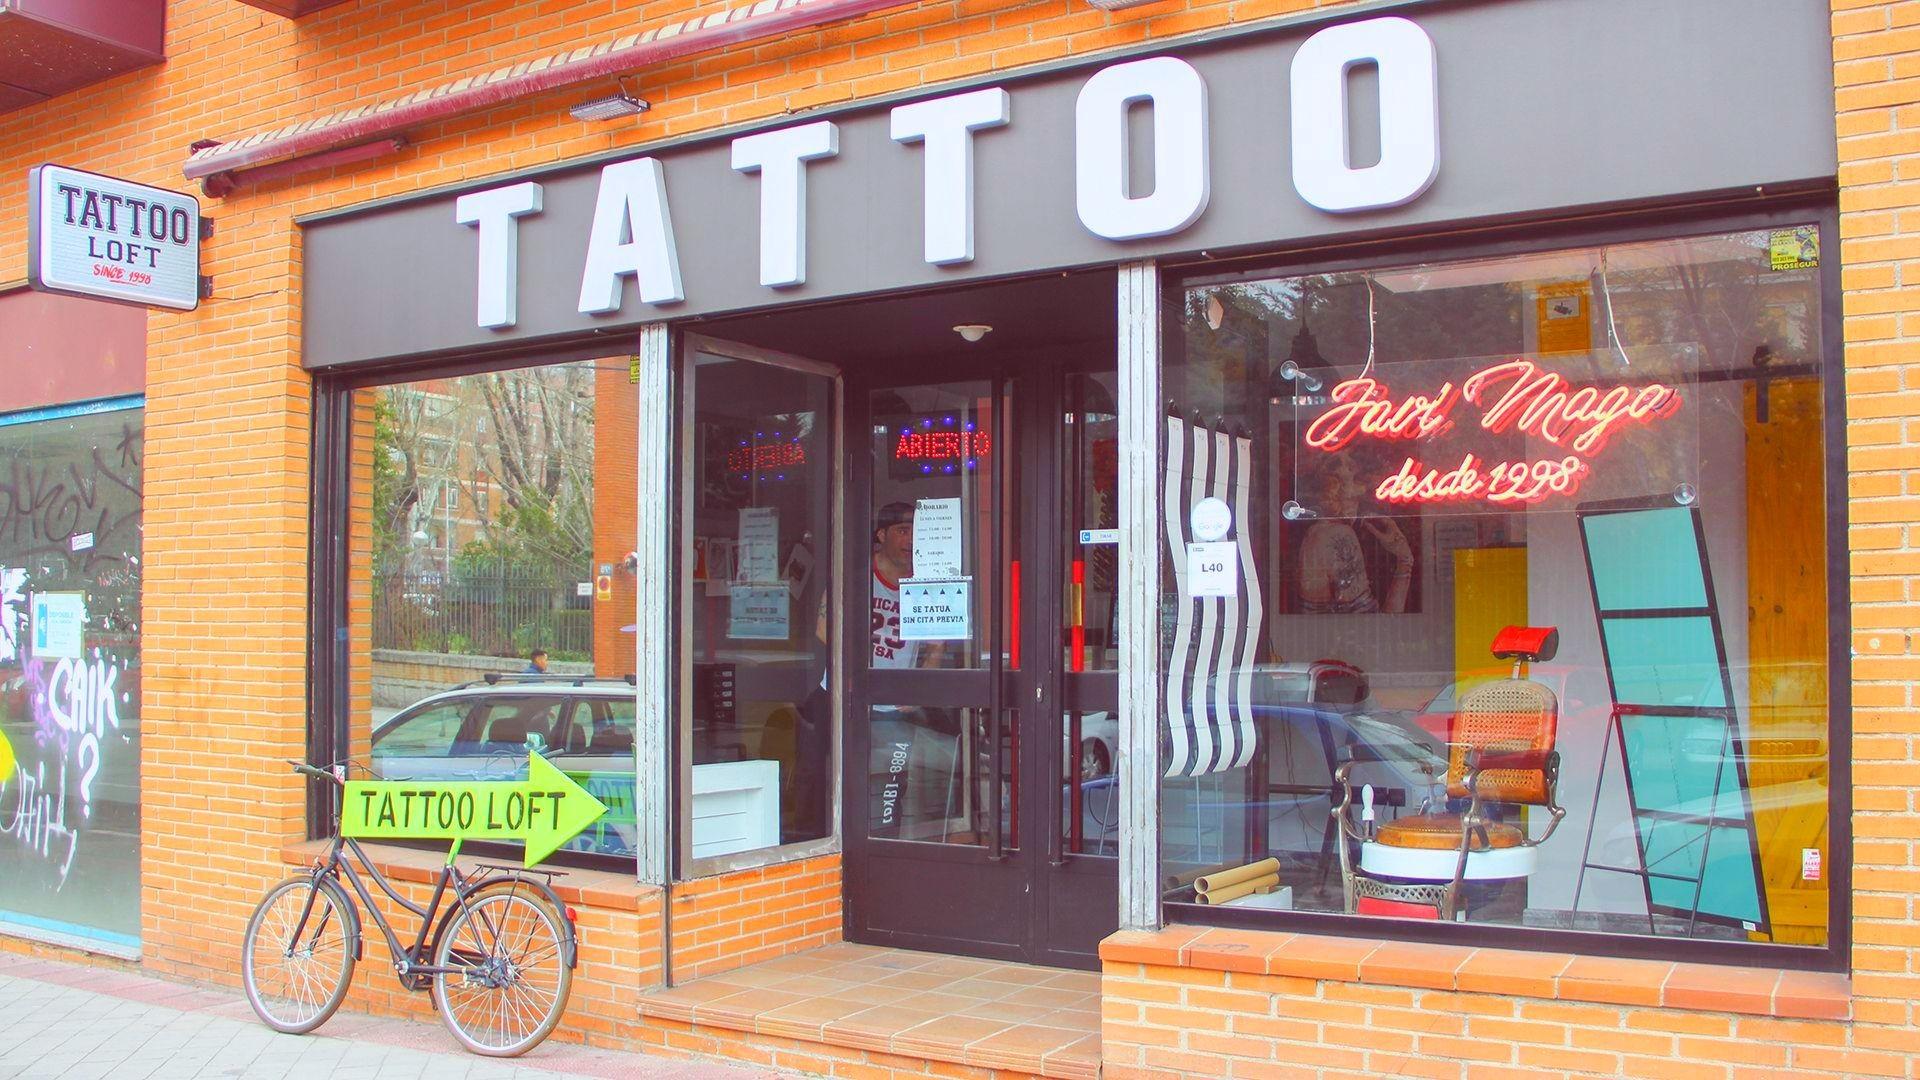 Tattoo fachada